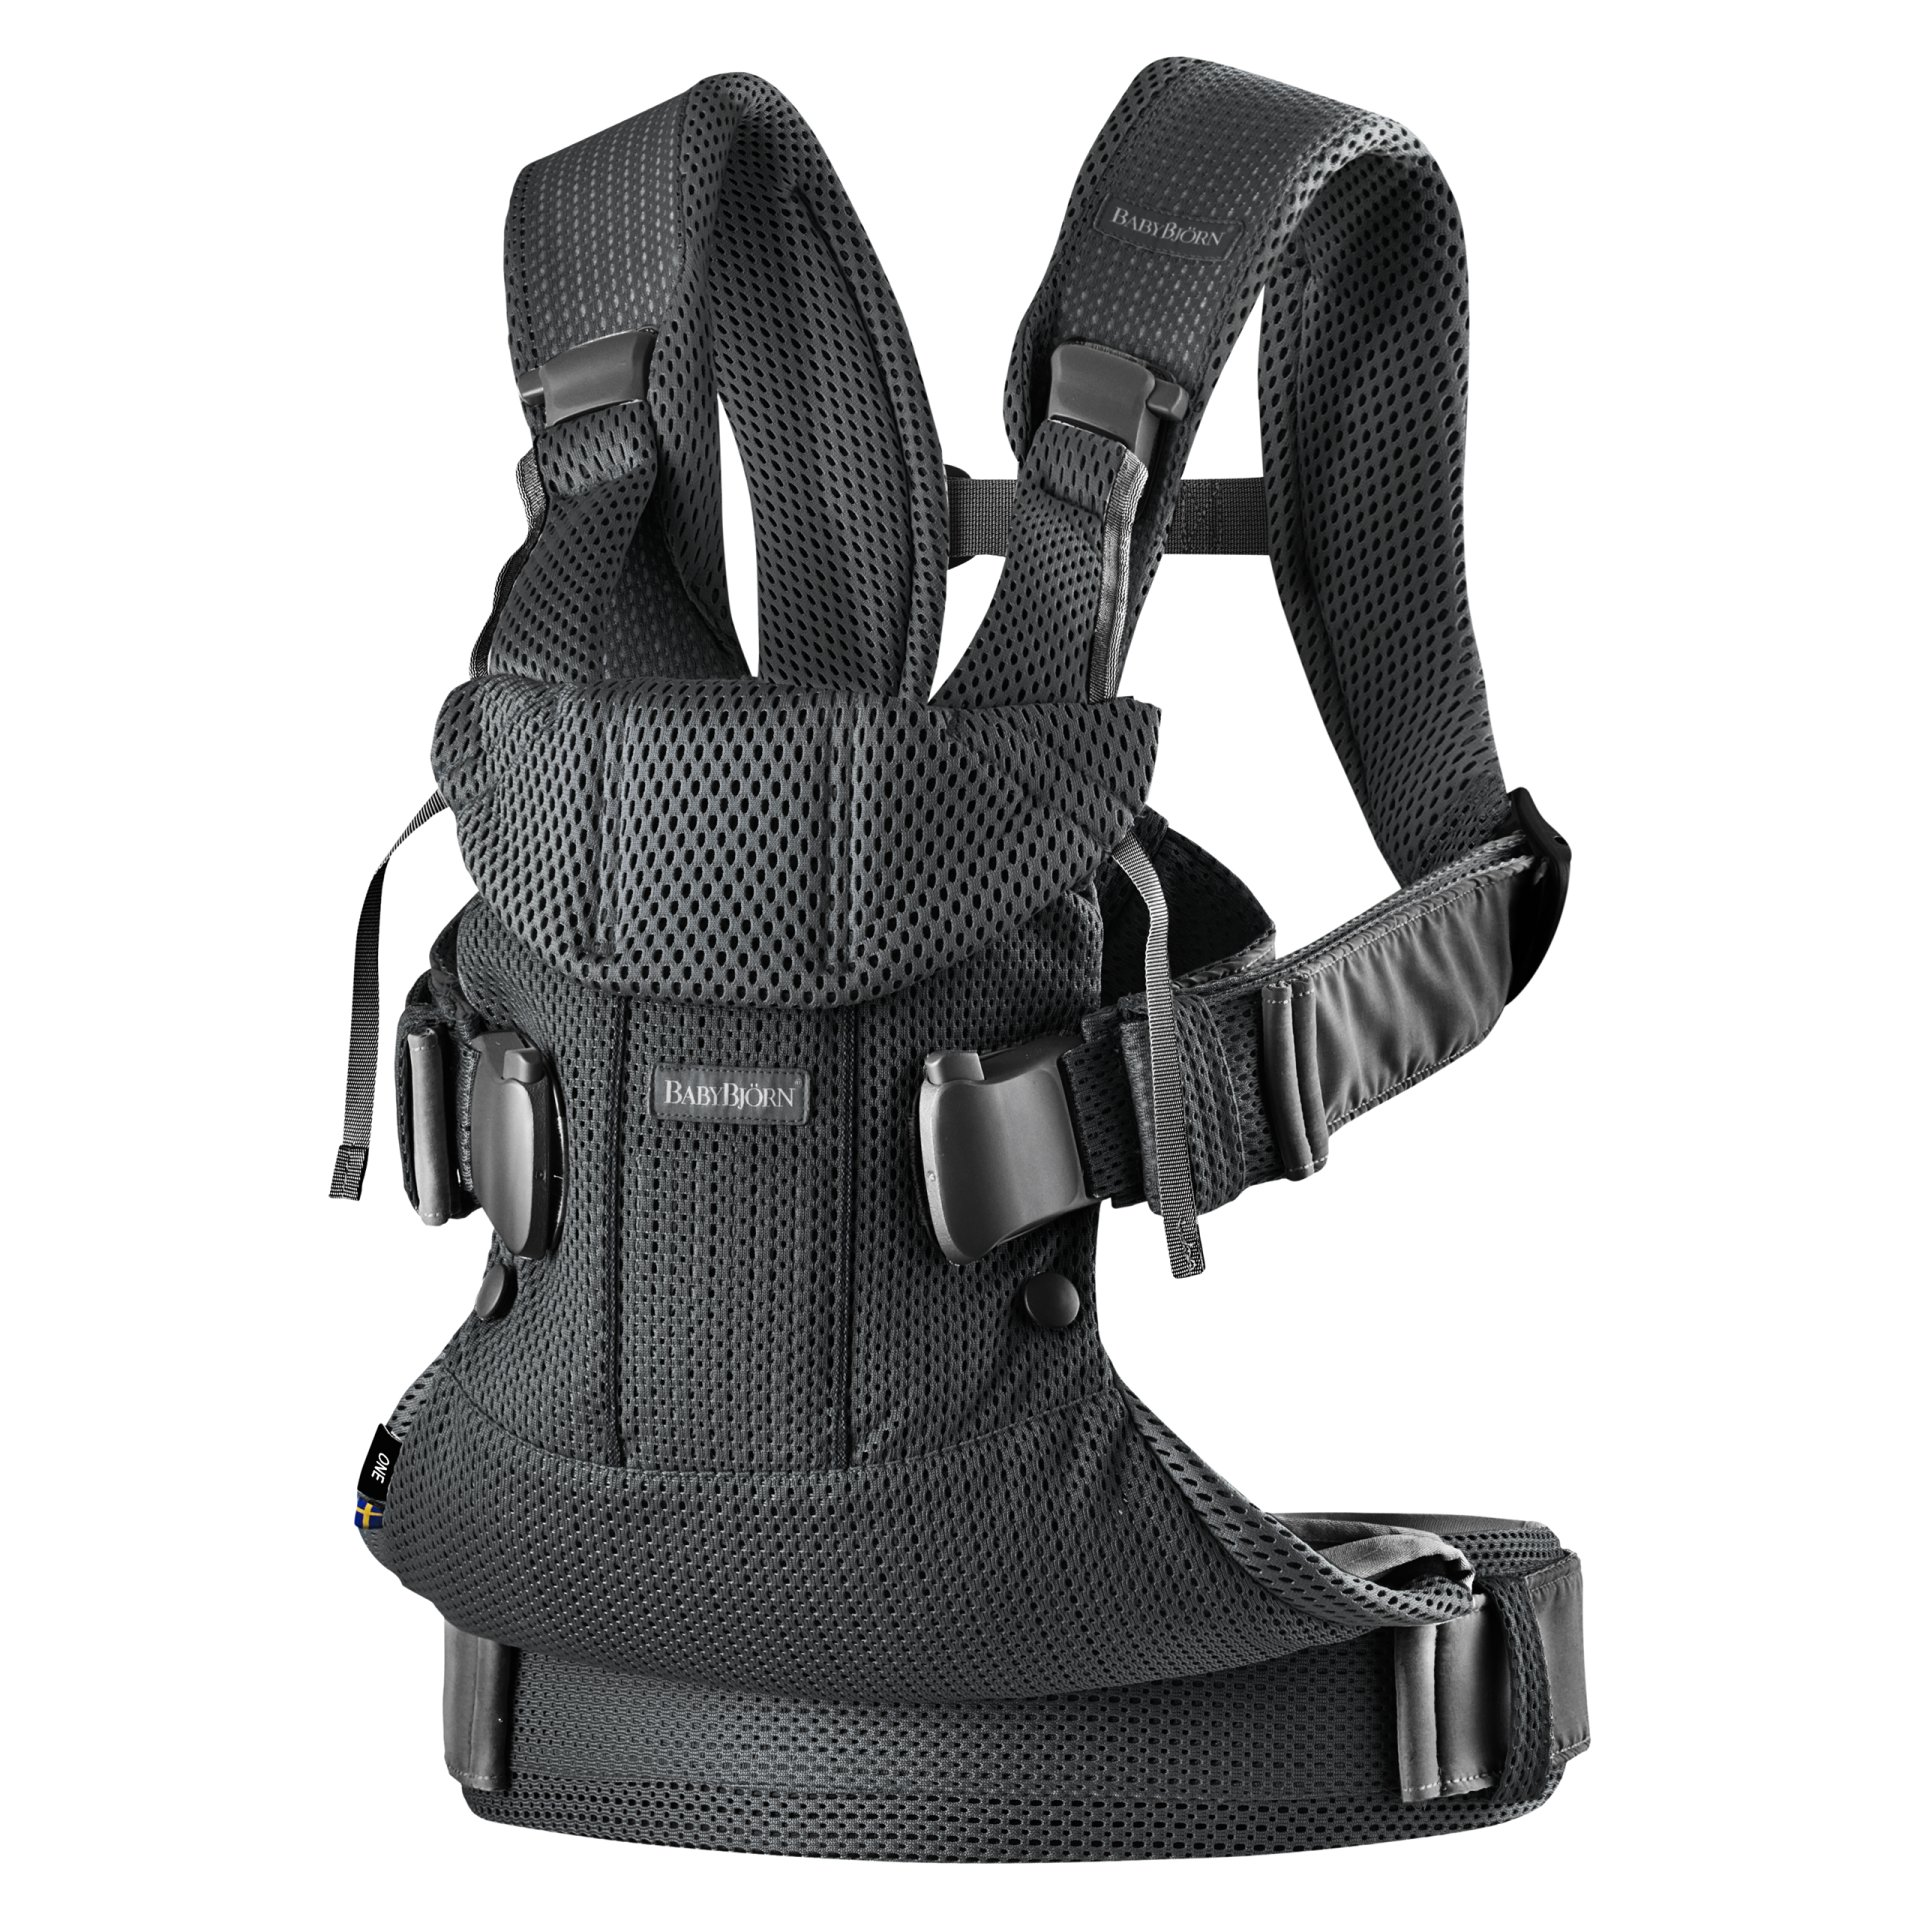 baby bjorn booster chair swivel jude carrier one air 2019 schwarz buy at kidsroom design